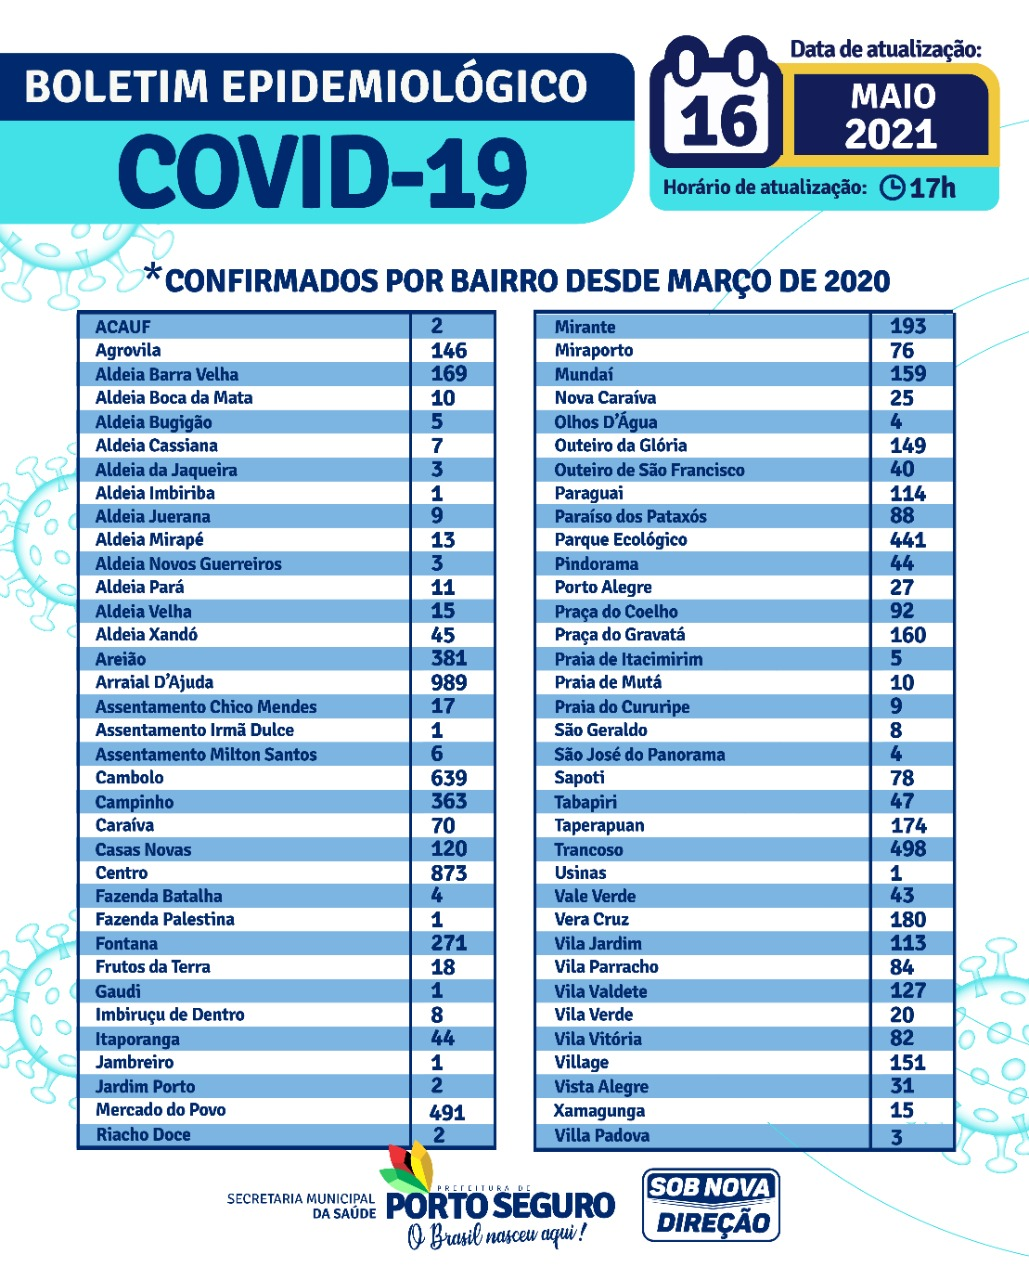 Porto Seguro: Boletim Epidemiológico Covid-19 (16/05/2021) 24